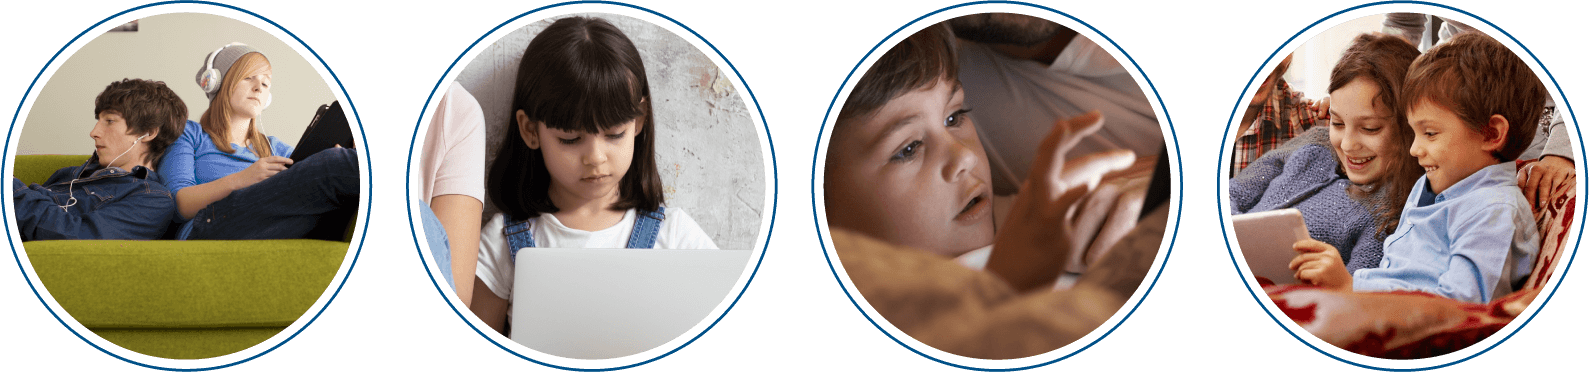 Children On Devices